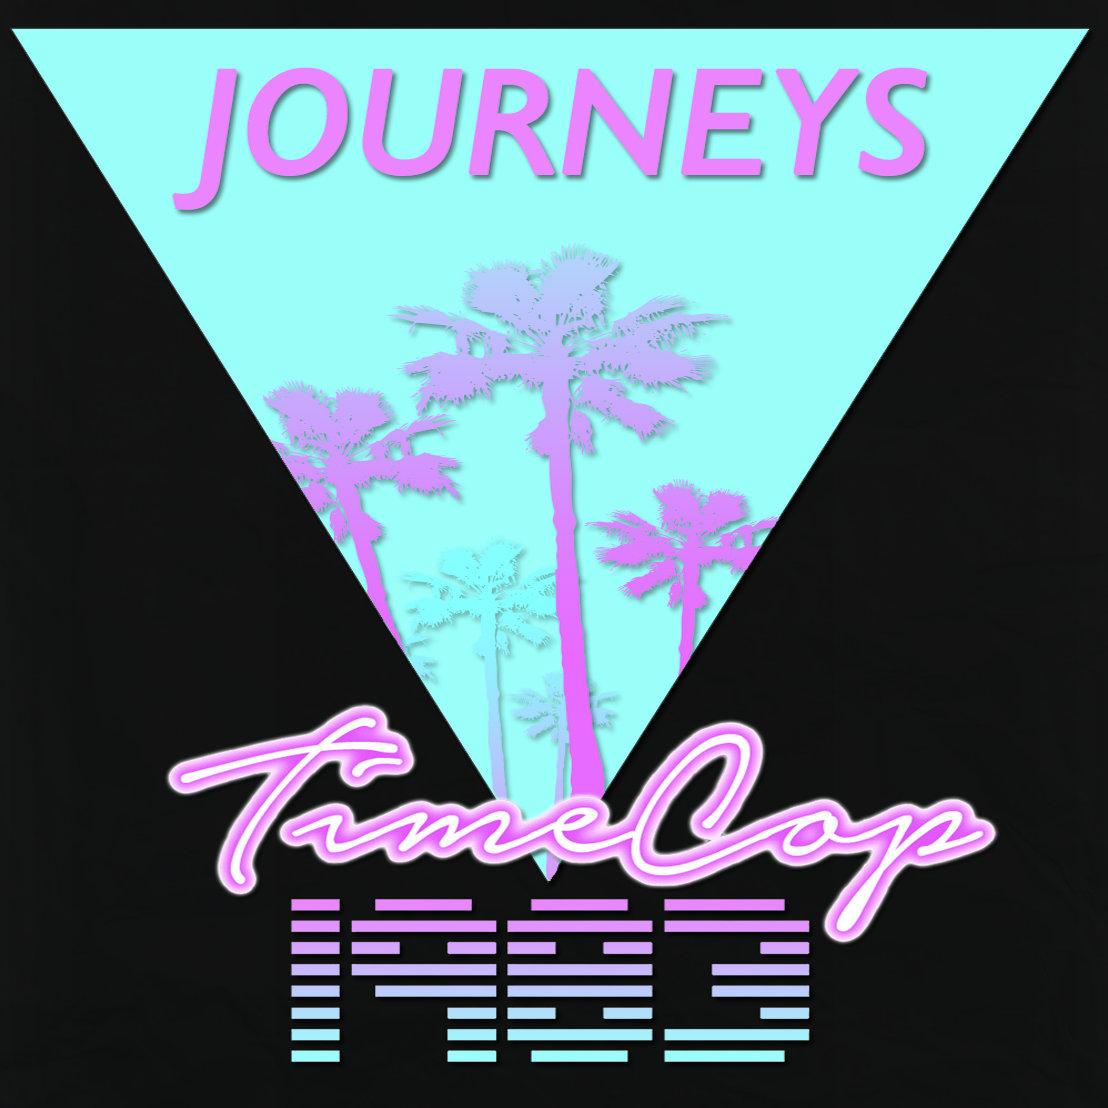 Timecop1983 - Journeys